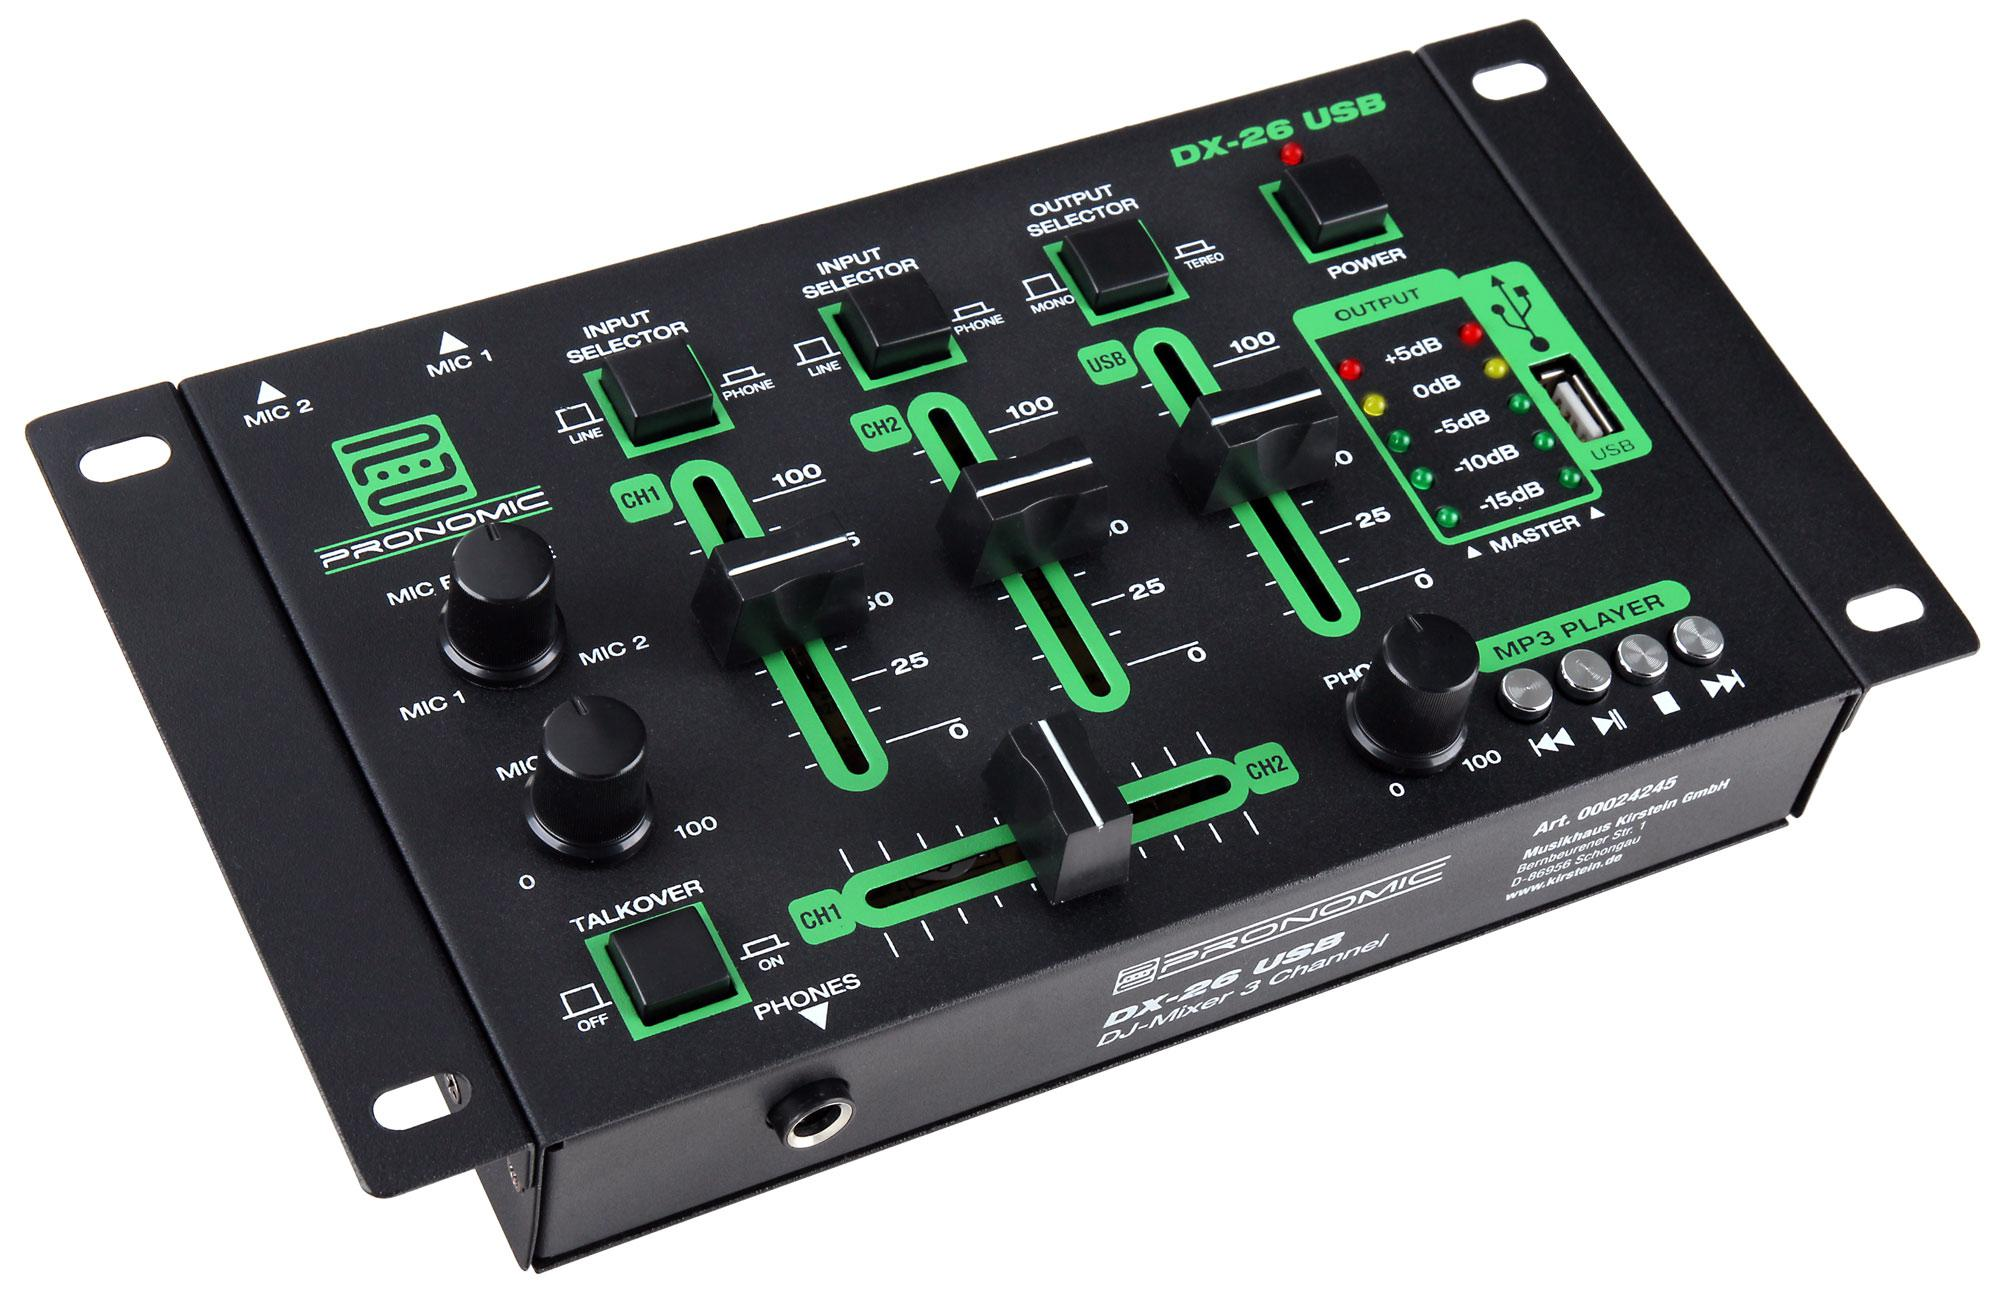 Pronomic DX 26 USB DJ Mixer